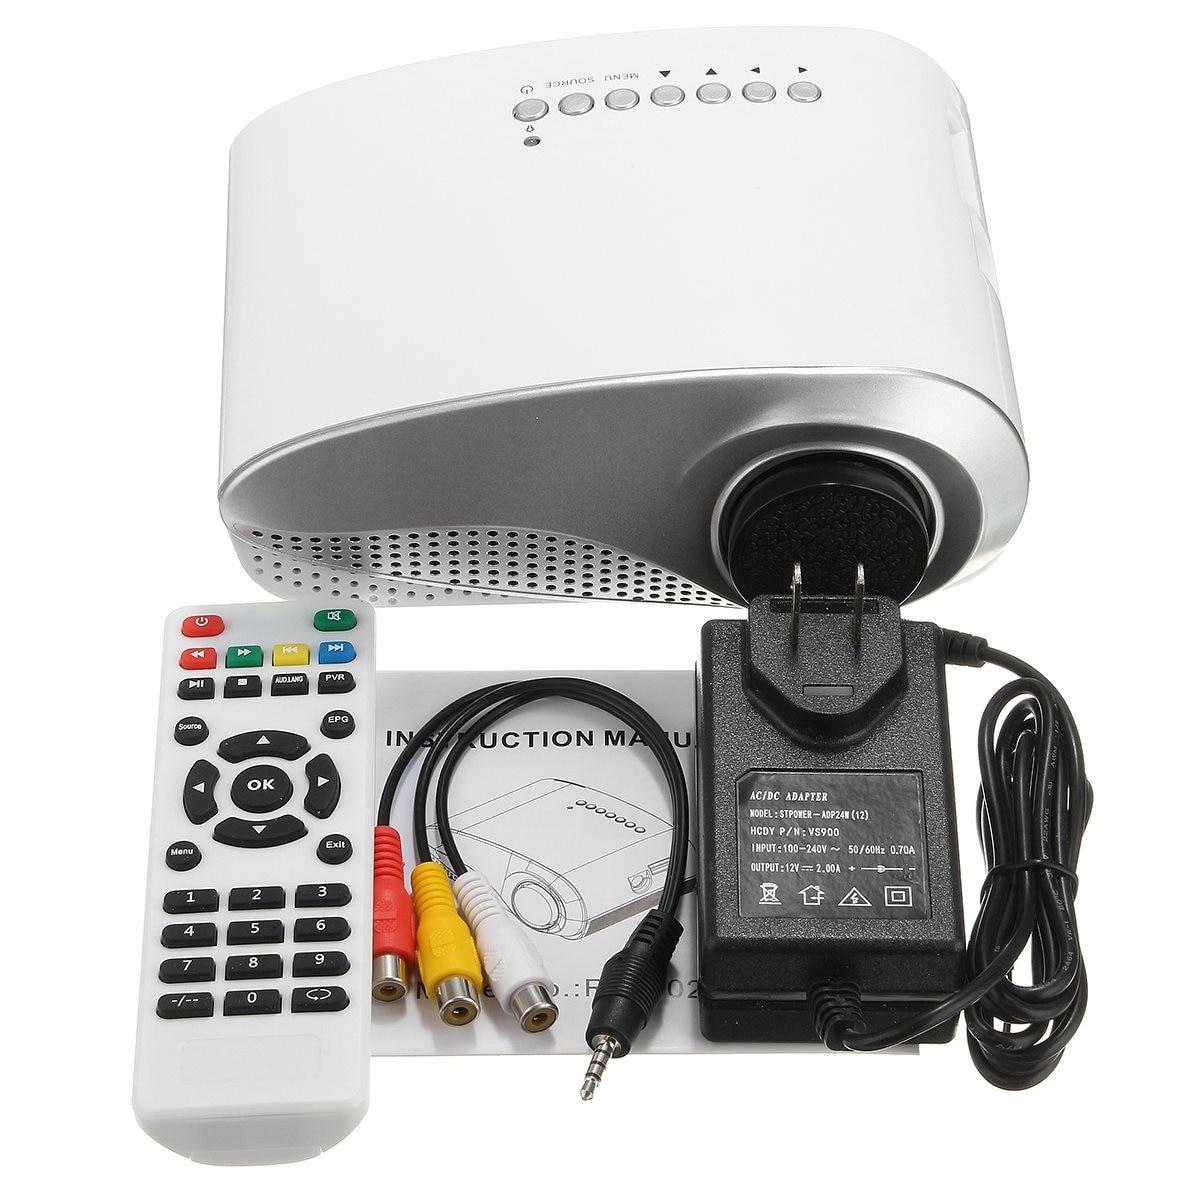 Best Promotion 802 Mini Home Multimedia Cinema LED 1080P Projector AV TV VGA USB HDMI SD Trendy Private Theater White US/EU plug rd 802 24w led hd home mini projector w hdmi vga usb remote control blue us plug